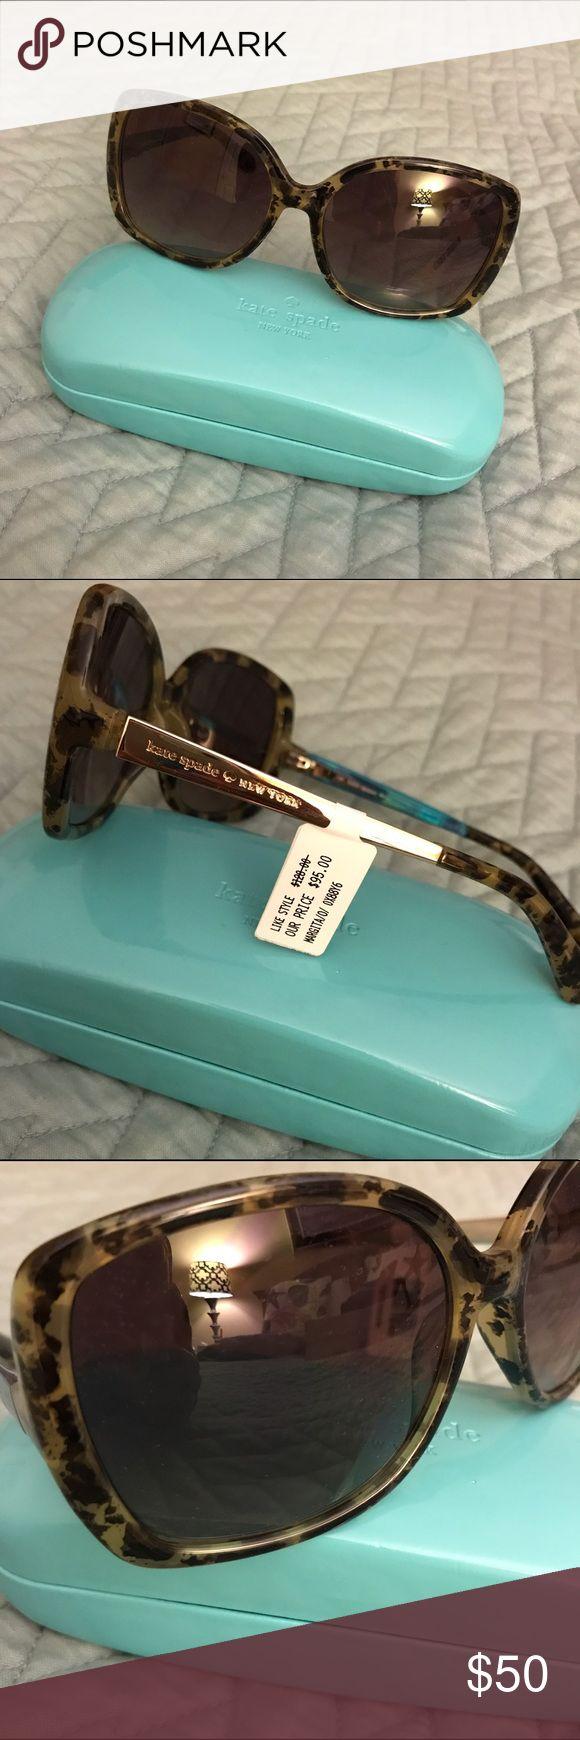 Kate Spade Sunglasses Tortoise Kate Spade sunglasses. Square shape. Never worn and tags on. Really cute style! kate spade Accessories Sunglasses